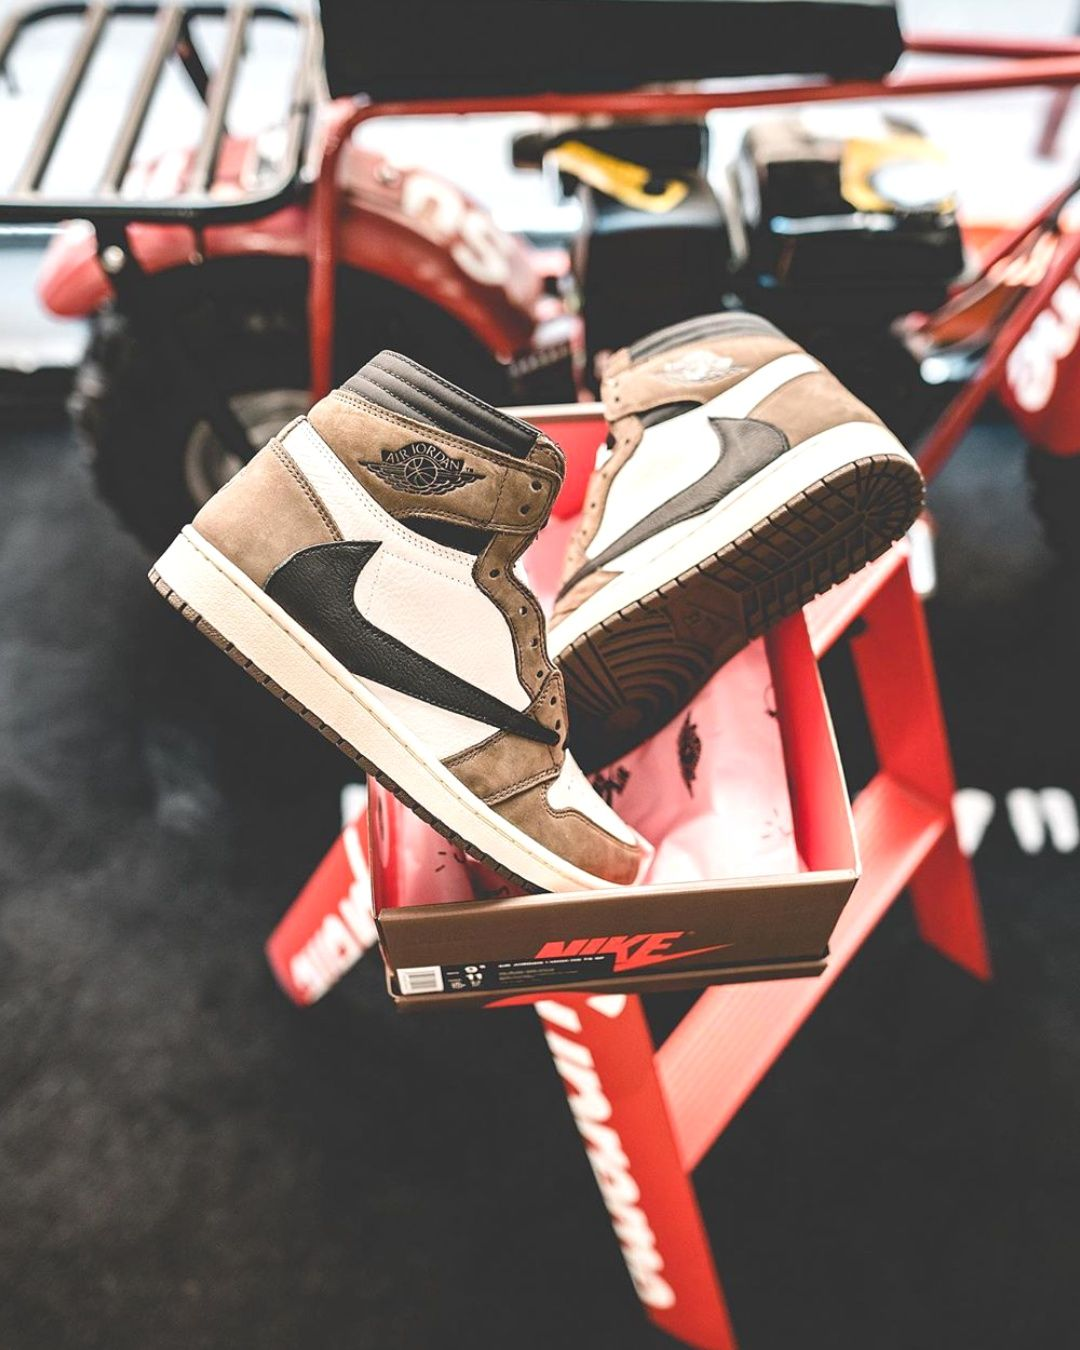 Jordan 1 Retro High Travis Scott 2020 Christmas Outifts Trendsoutfit Casual Shoes In 2020 Jordan 1 Retro High Travis Scott White Basketball Shoes